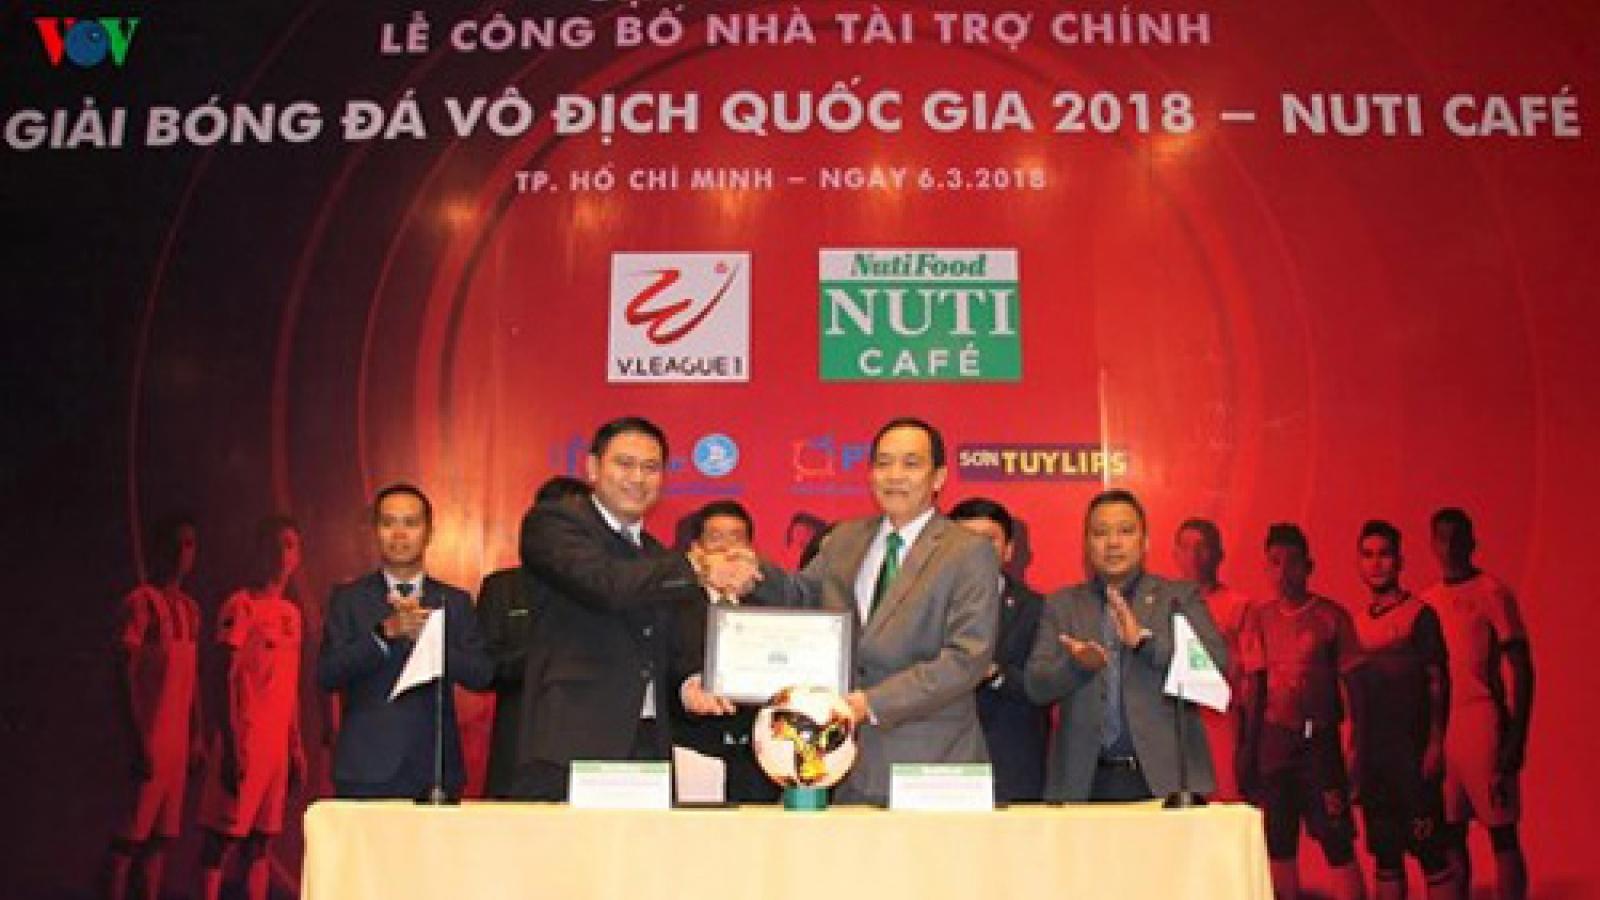 Nutifood signs on as main sponsor of V-League 2018